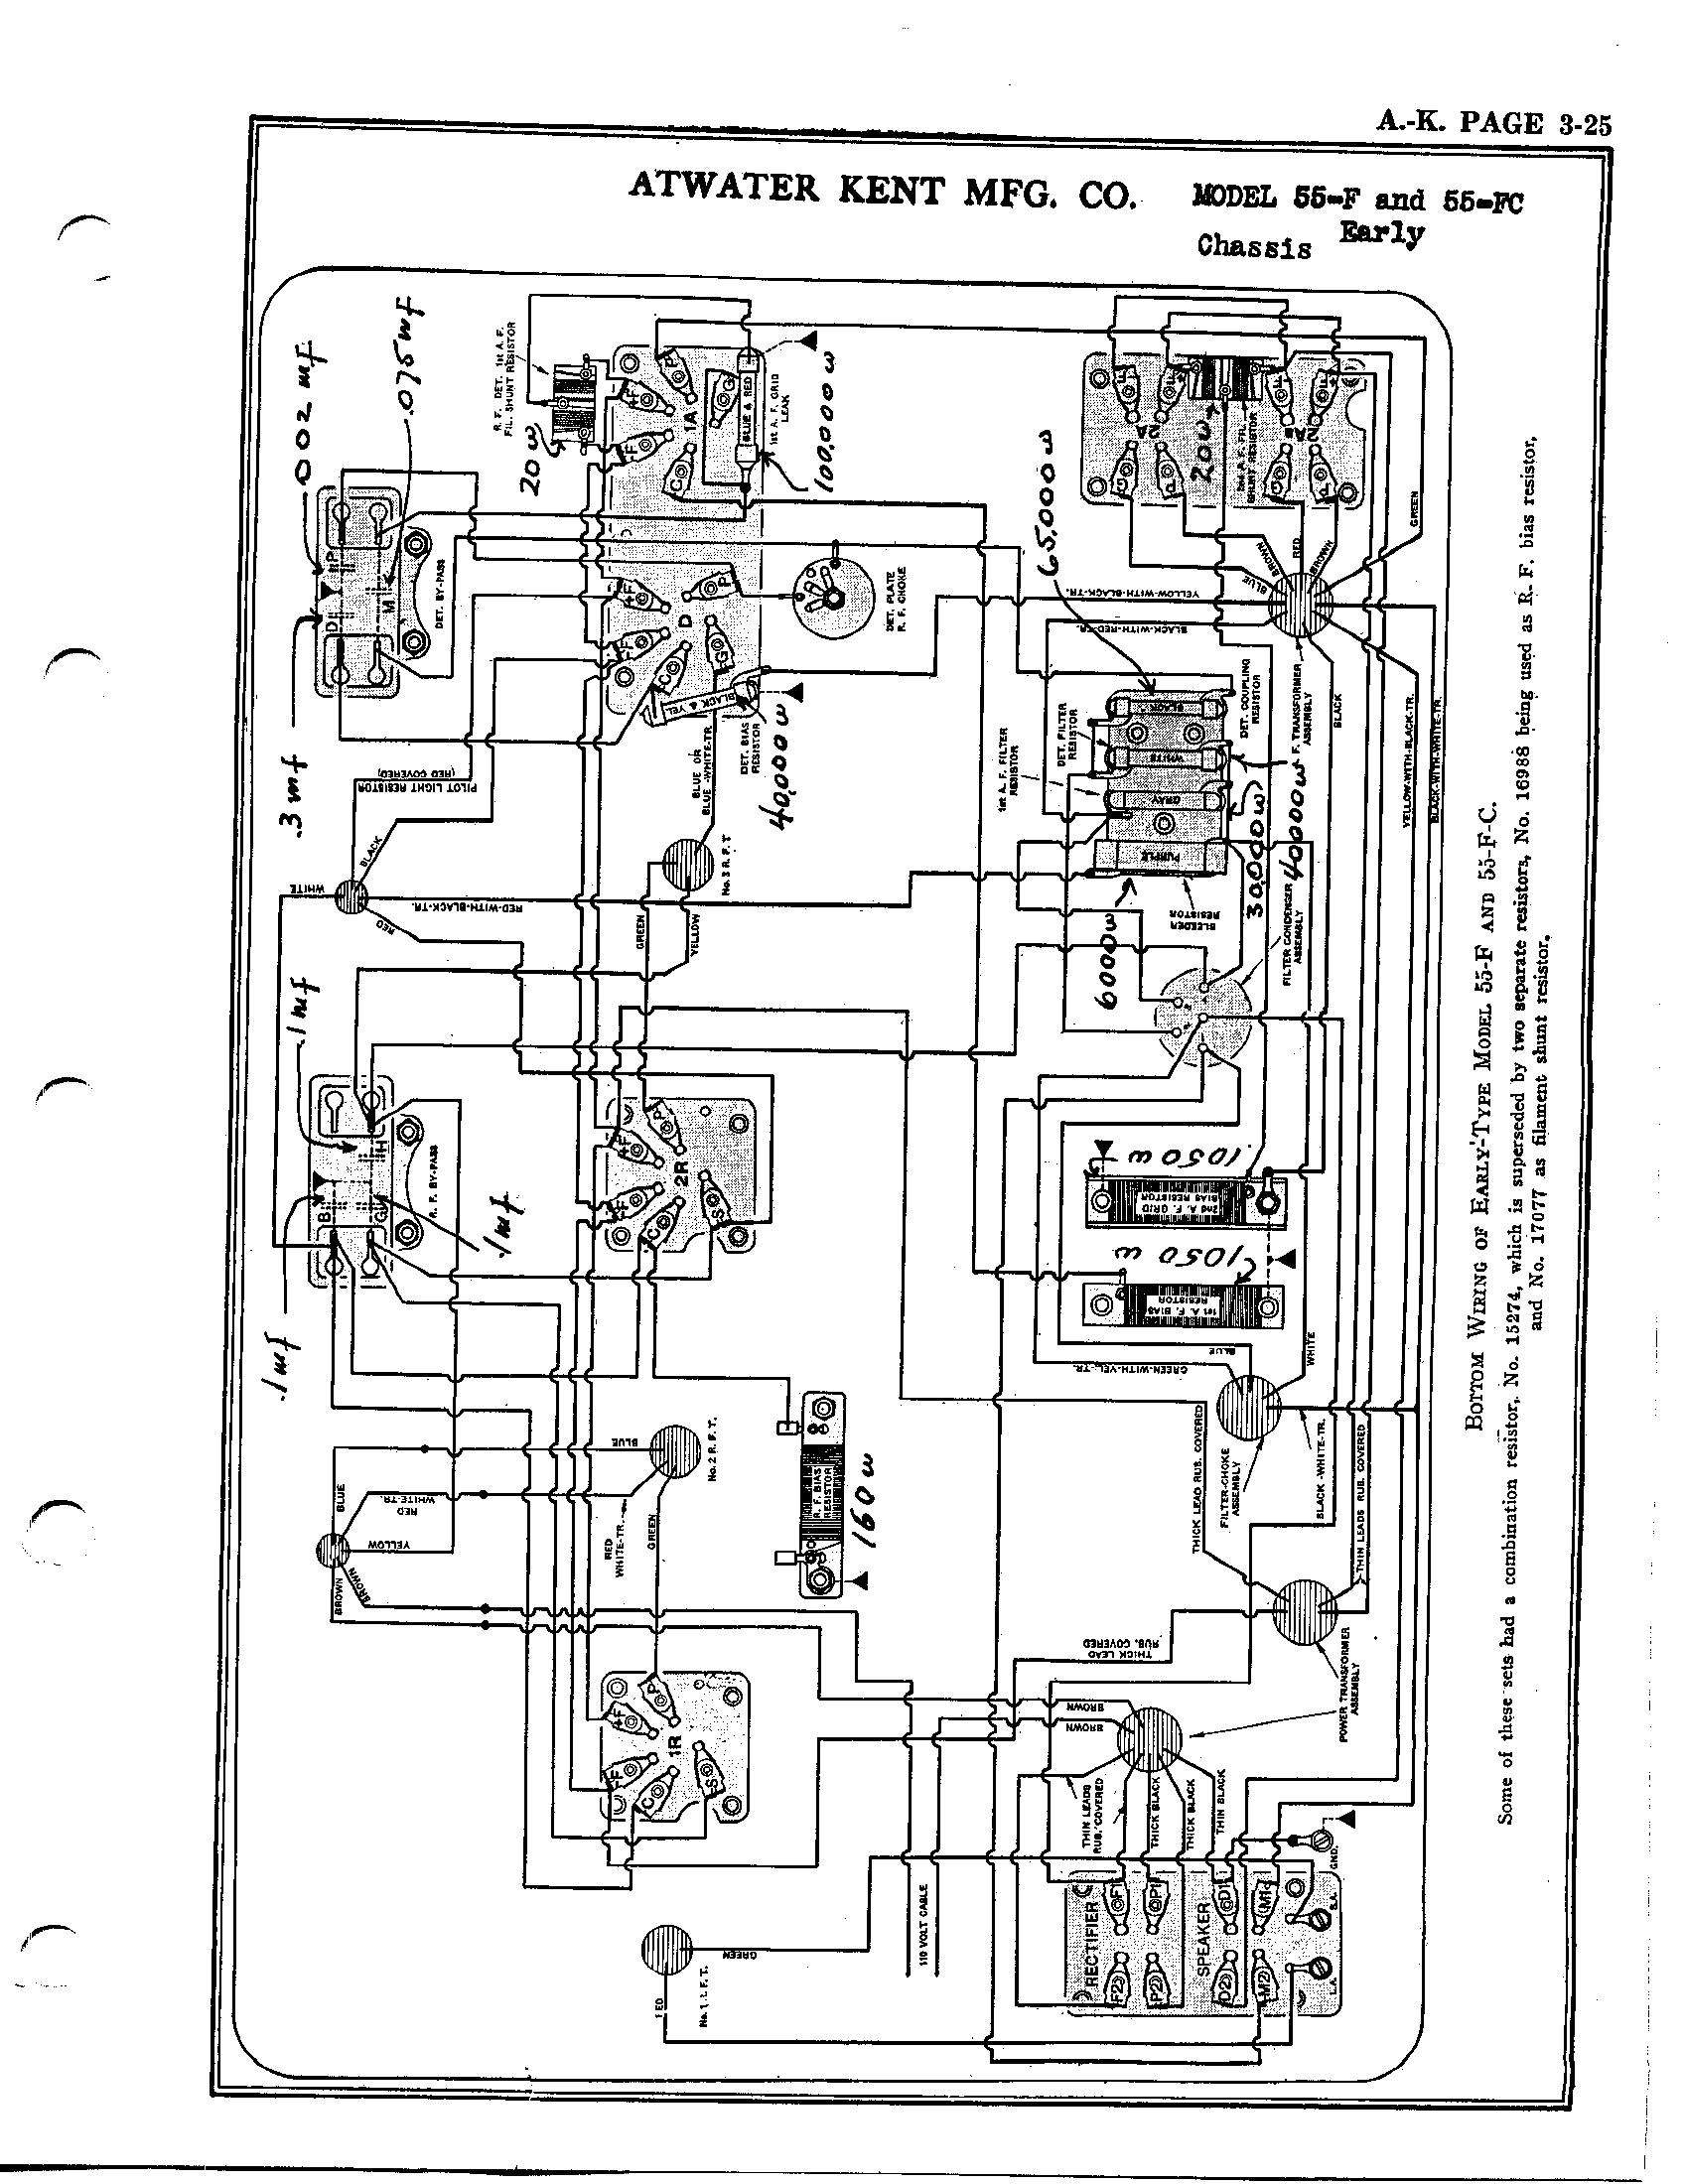 Pleasant Atwater Kent 55C Auto Electrical Wiring Diagram Wiring Cloud Inklaidewilluminateatxorg